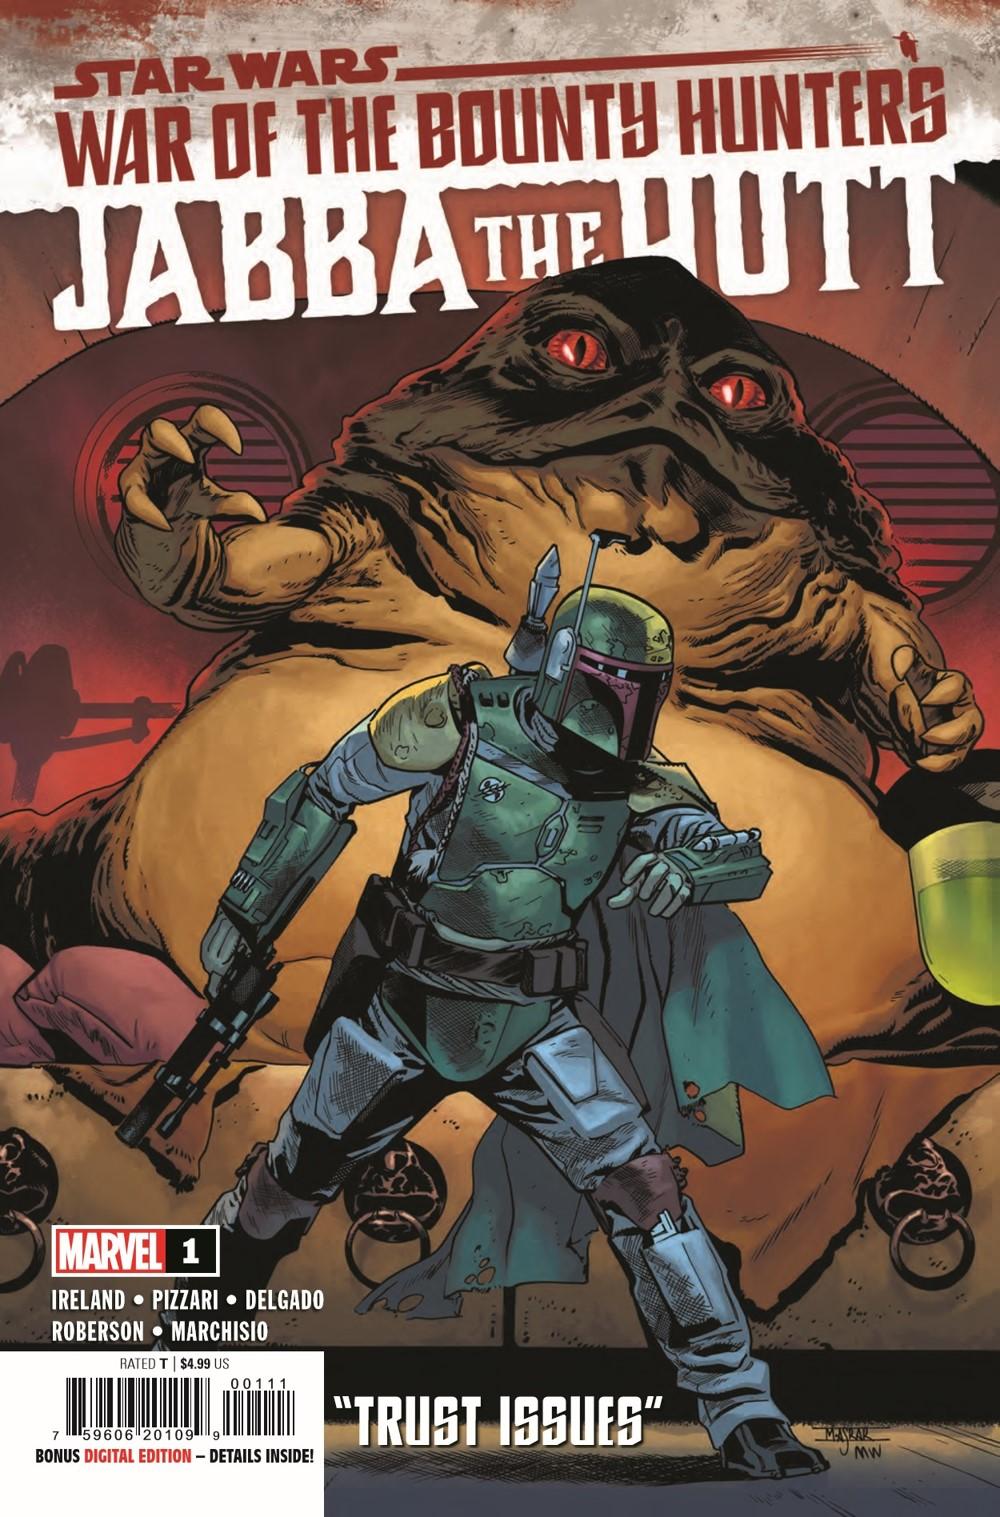 STWWAROTBHJABBAT2021001_Preview-1 ComicList Previews: STAR WARS WAR OF THE BOUNTY HUNTERS JABBA THE HUTT #1